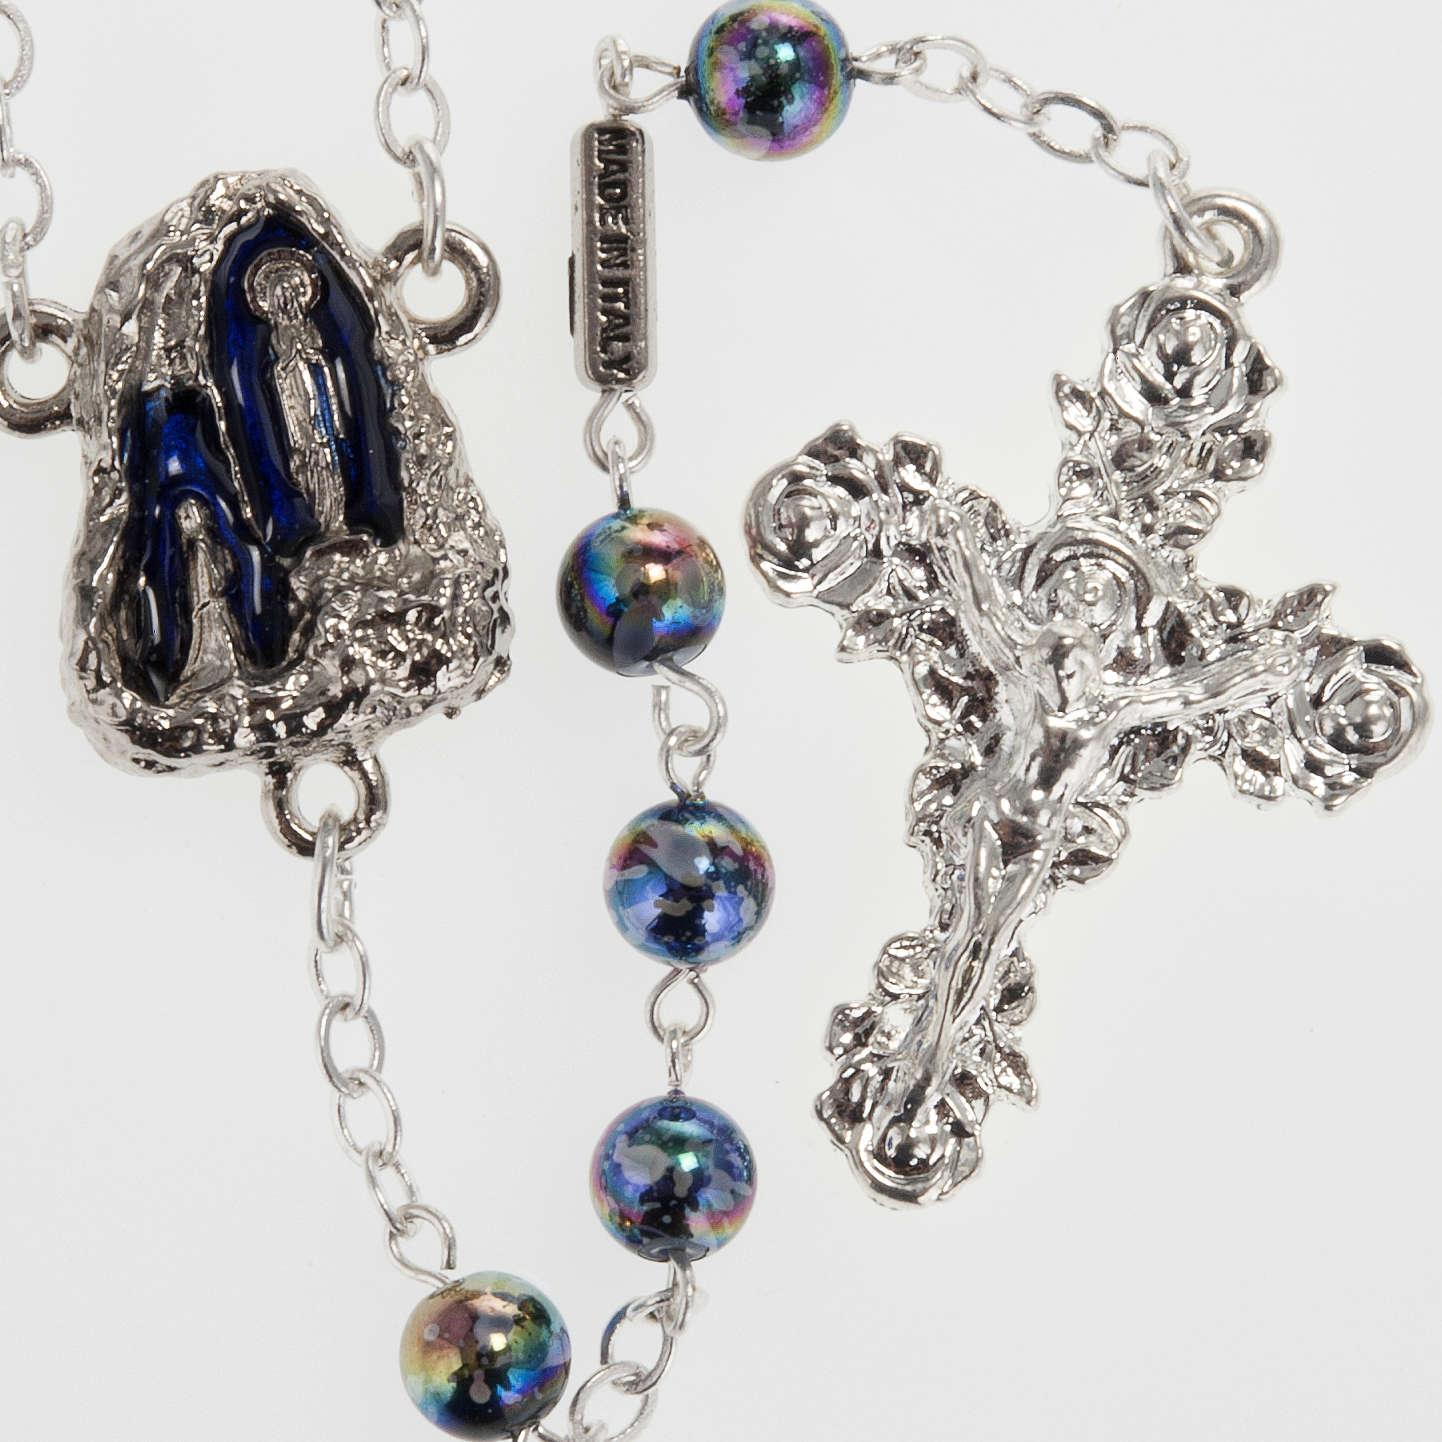 Ghirelli rosary Lourdes Grotto, Aurora 6 mm 4